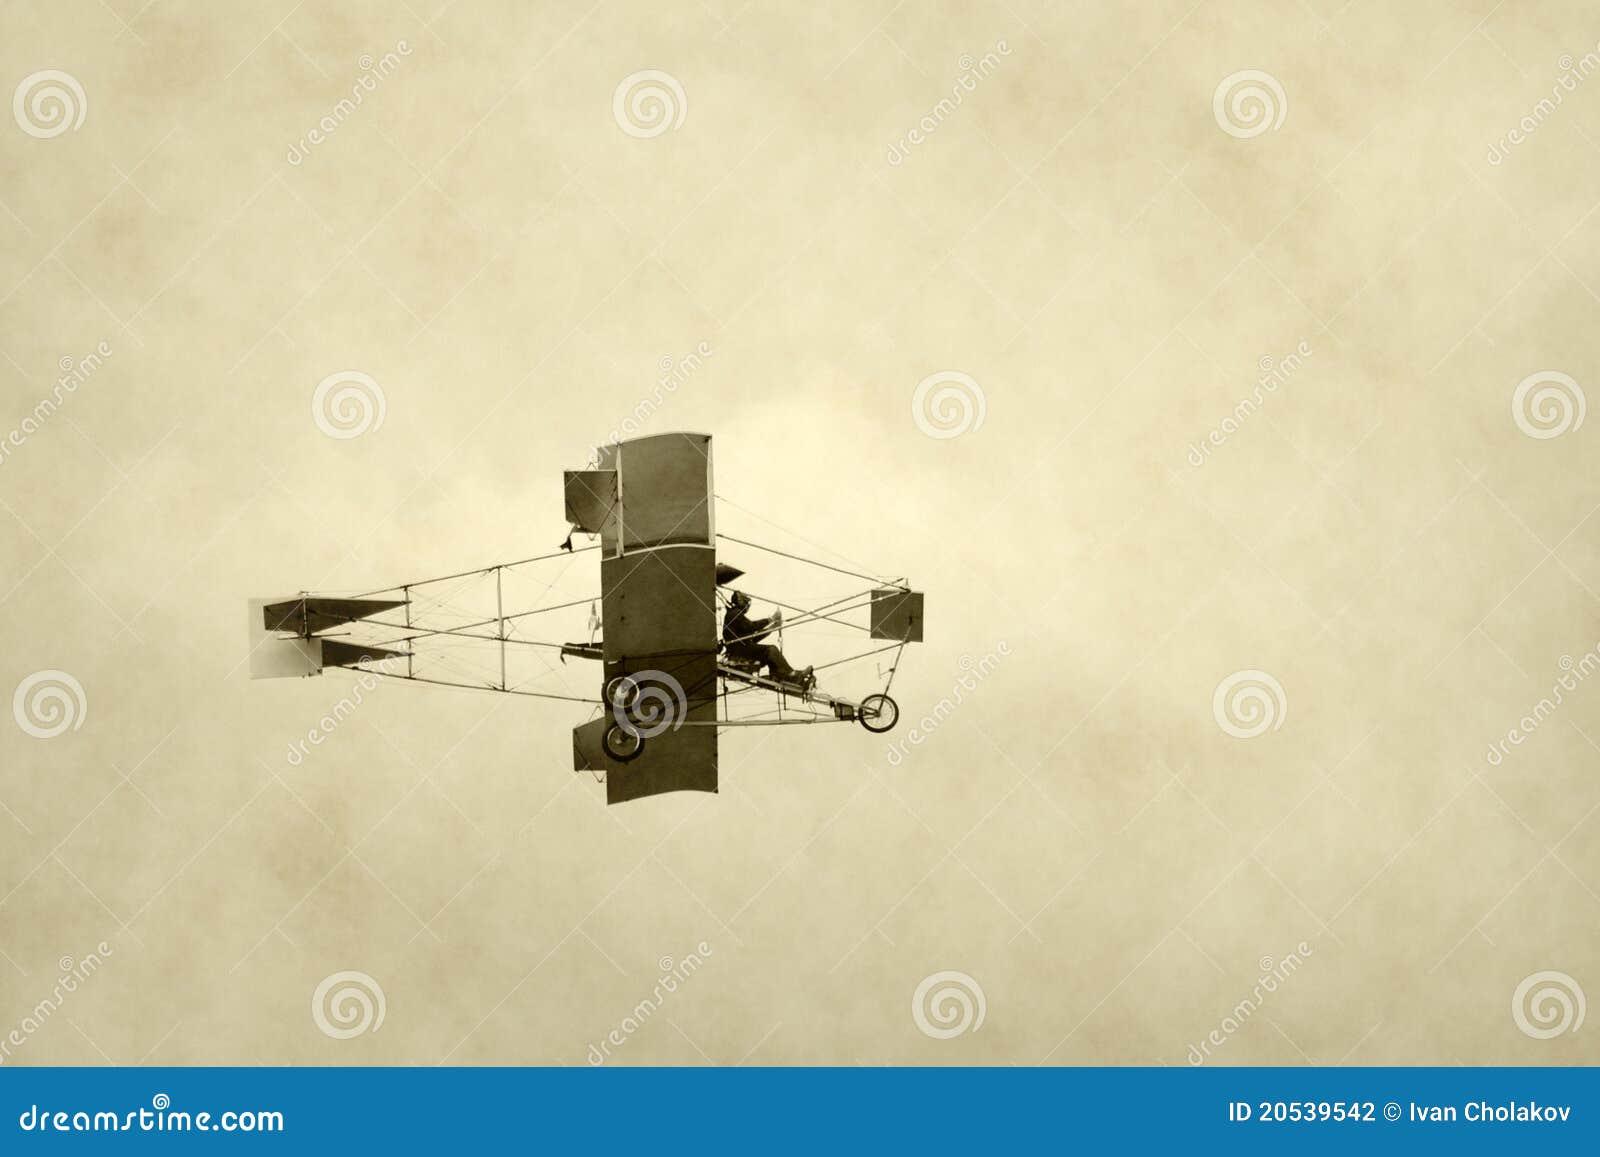 Primitive airplane